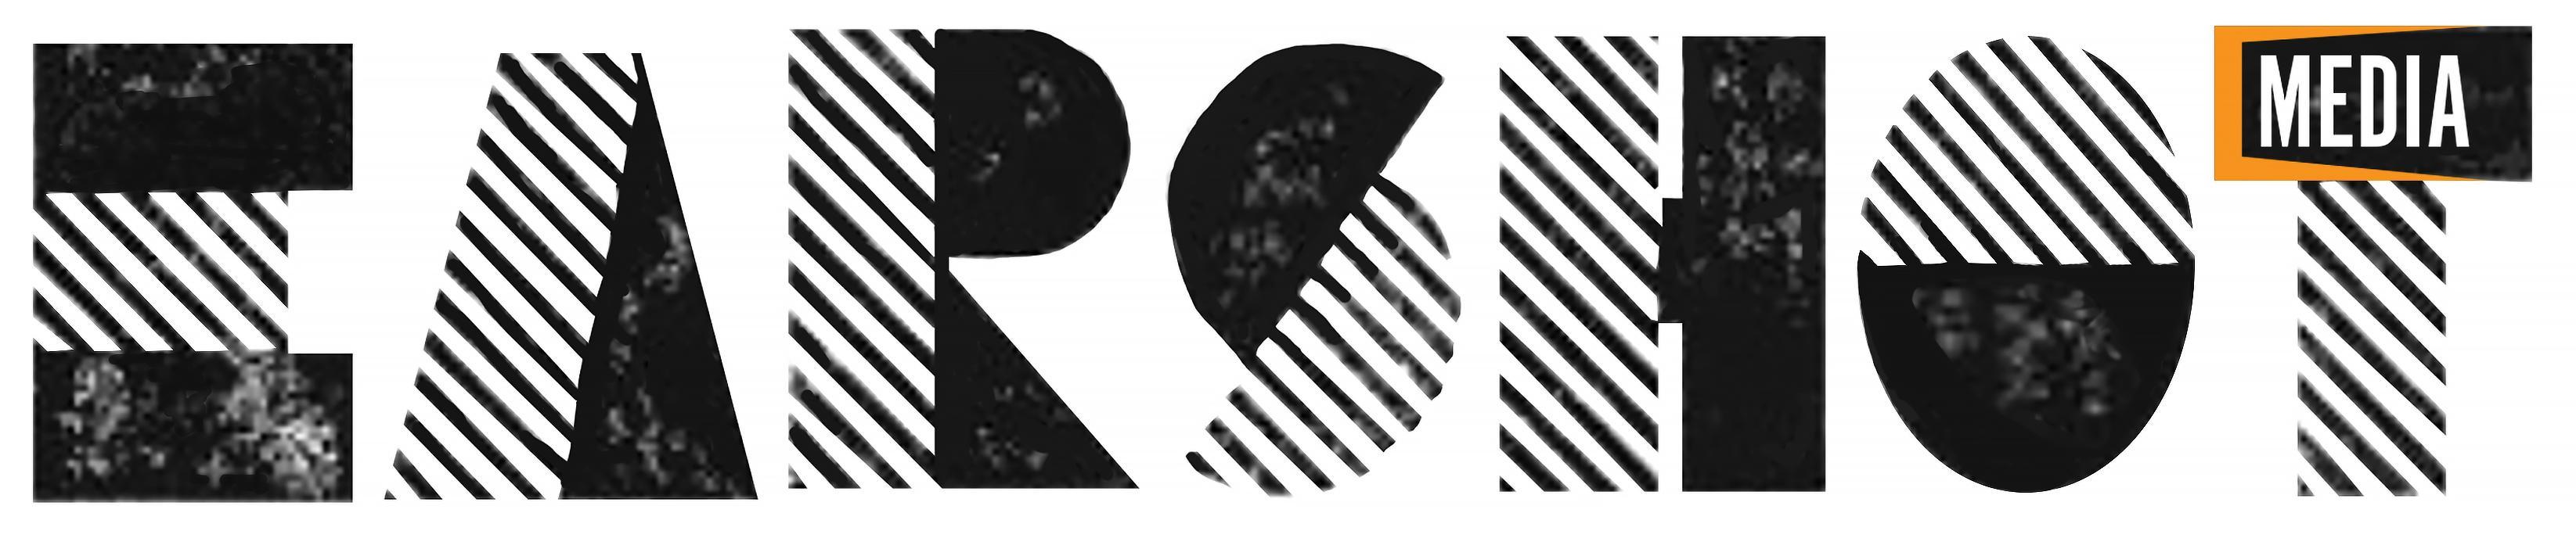 Earshot handdrawn logo final cleanest highest resolution